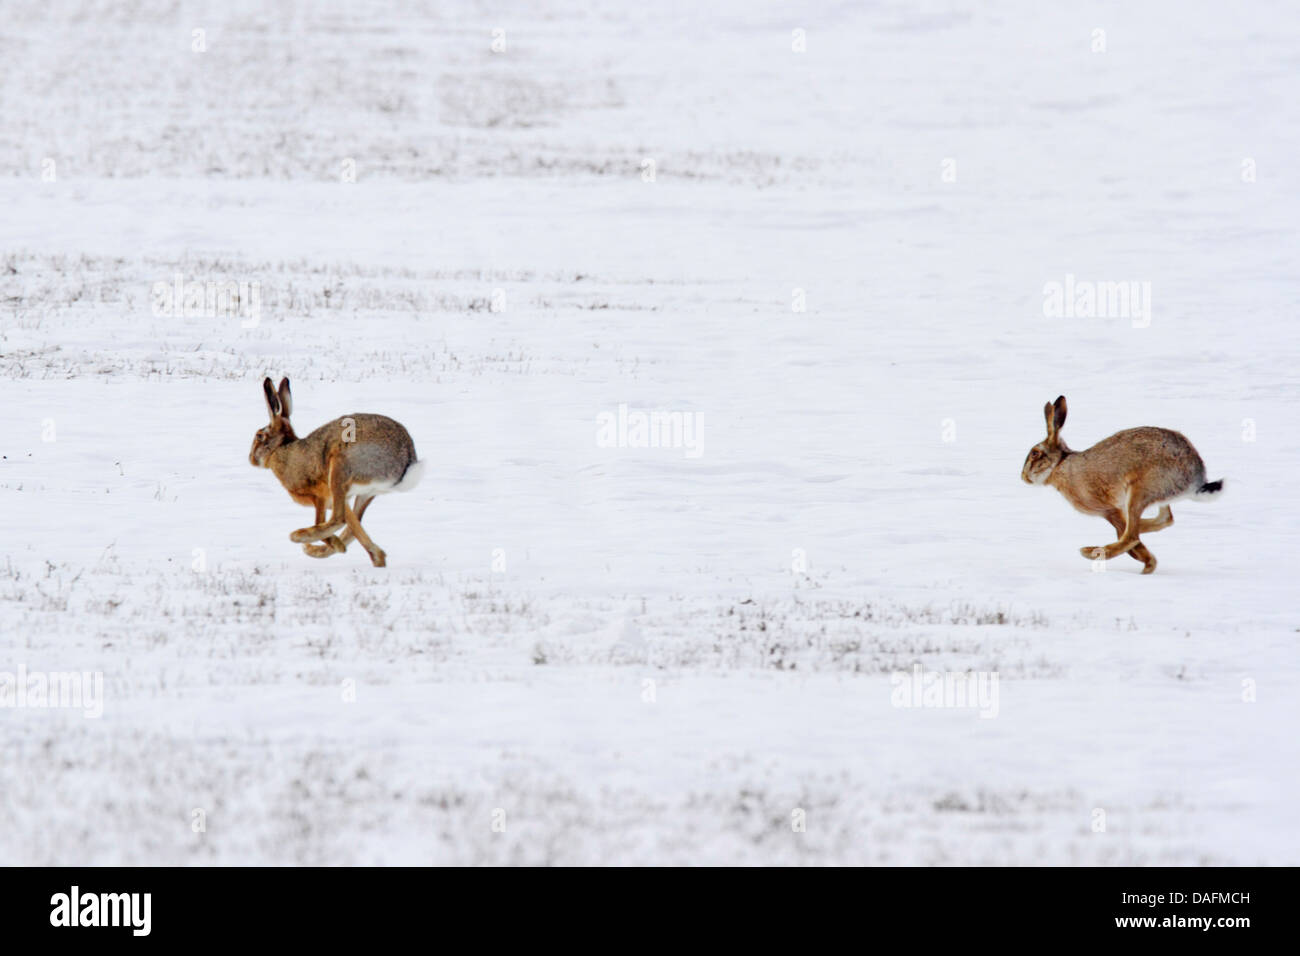 European hare, Brown hare (Lepus europaeus), mating season in winter, Austria, Burgenland - Stock Image